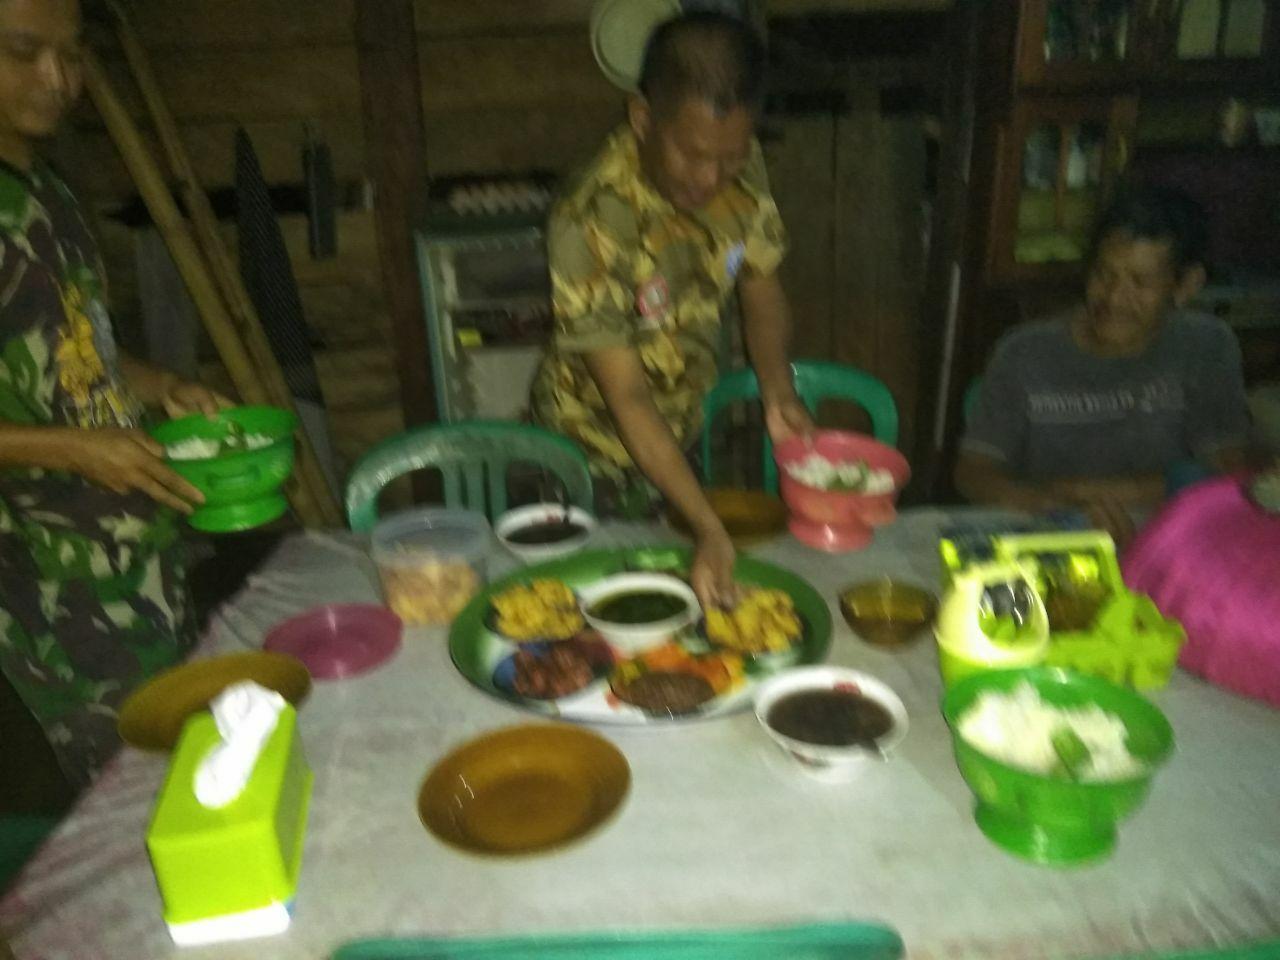 Makan Malam Bersama Warga Bakal Jadi Kenangan Tersendiri Bagi Satgas TMMD